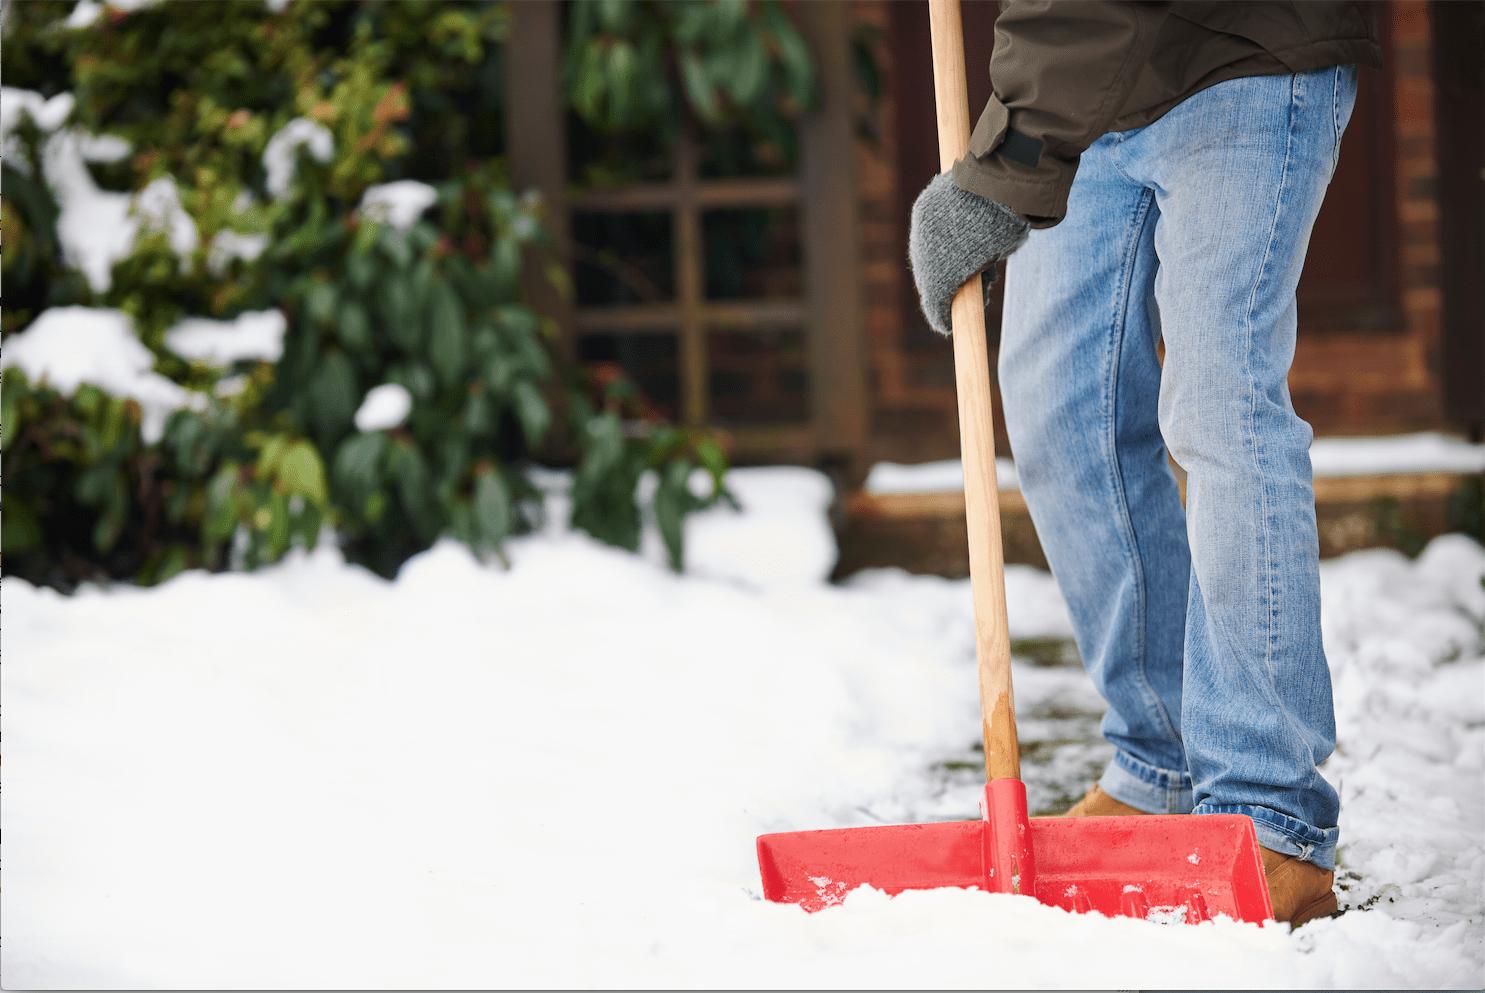 Your Last-Minute Winter Home Checklist